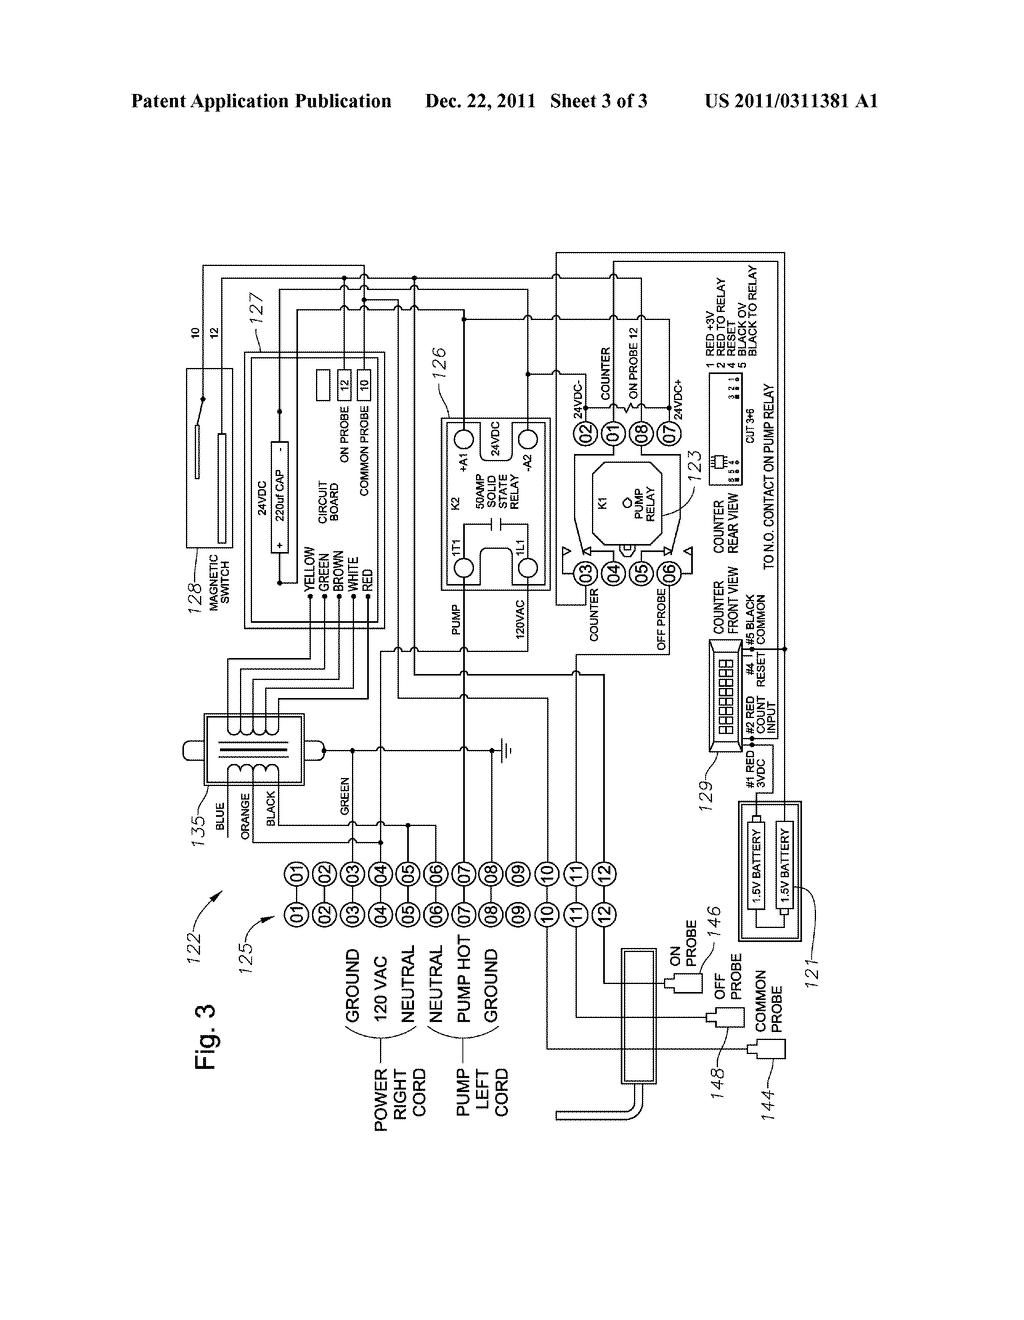 20110311381_04?resize\\\=665%2C857 marley pump wiring diagram wiring diagrams marley extractor fan wiring diagram at bakdesigns.co